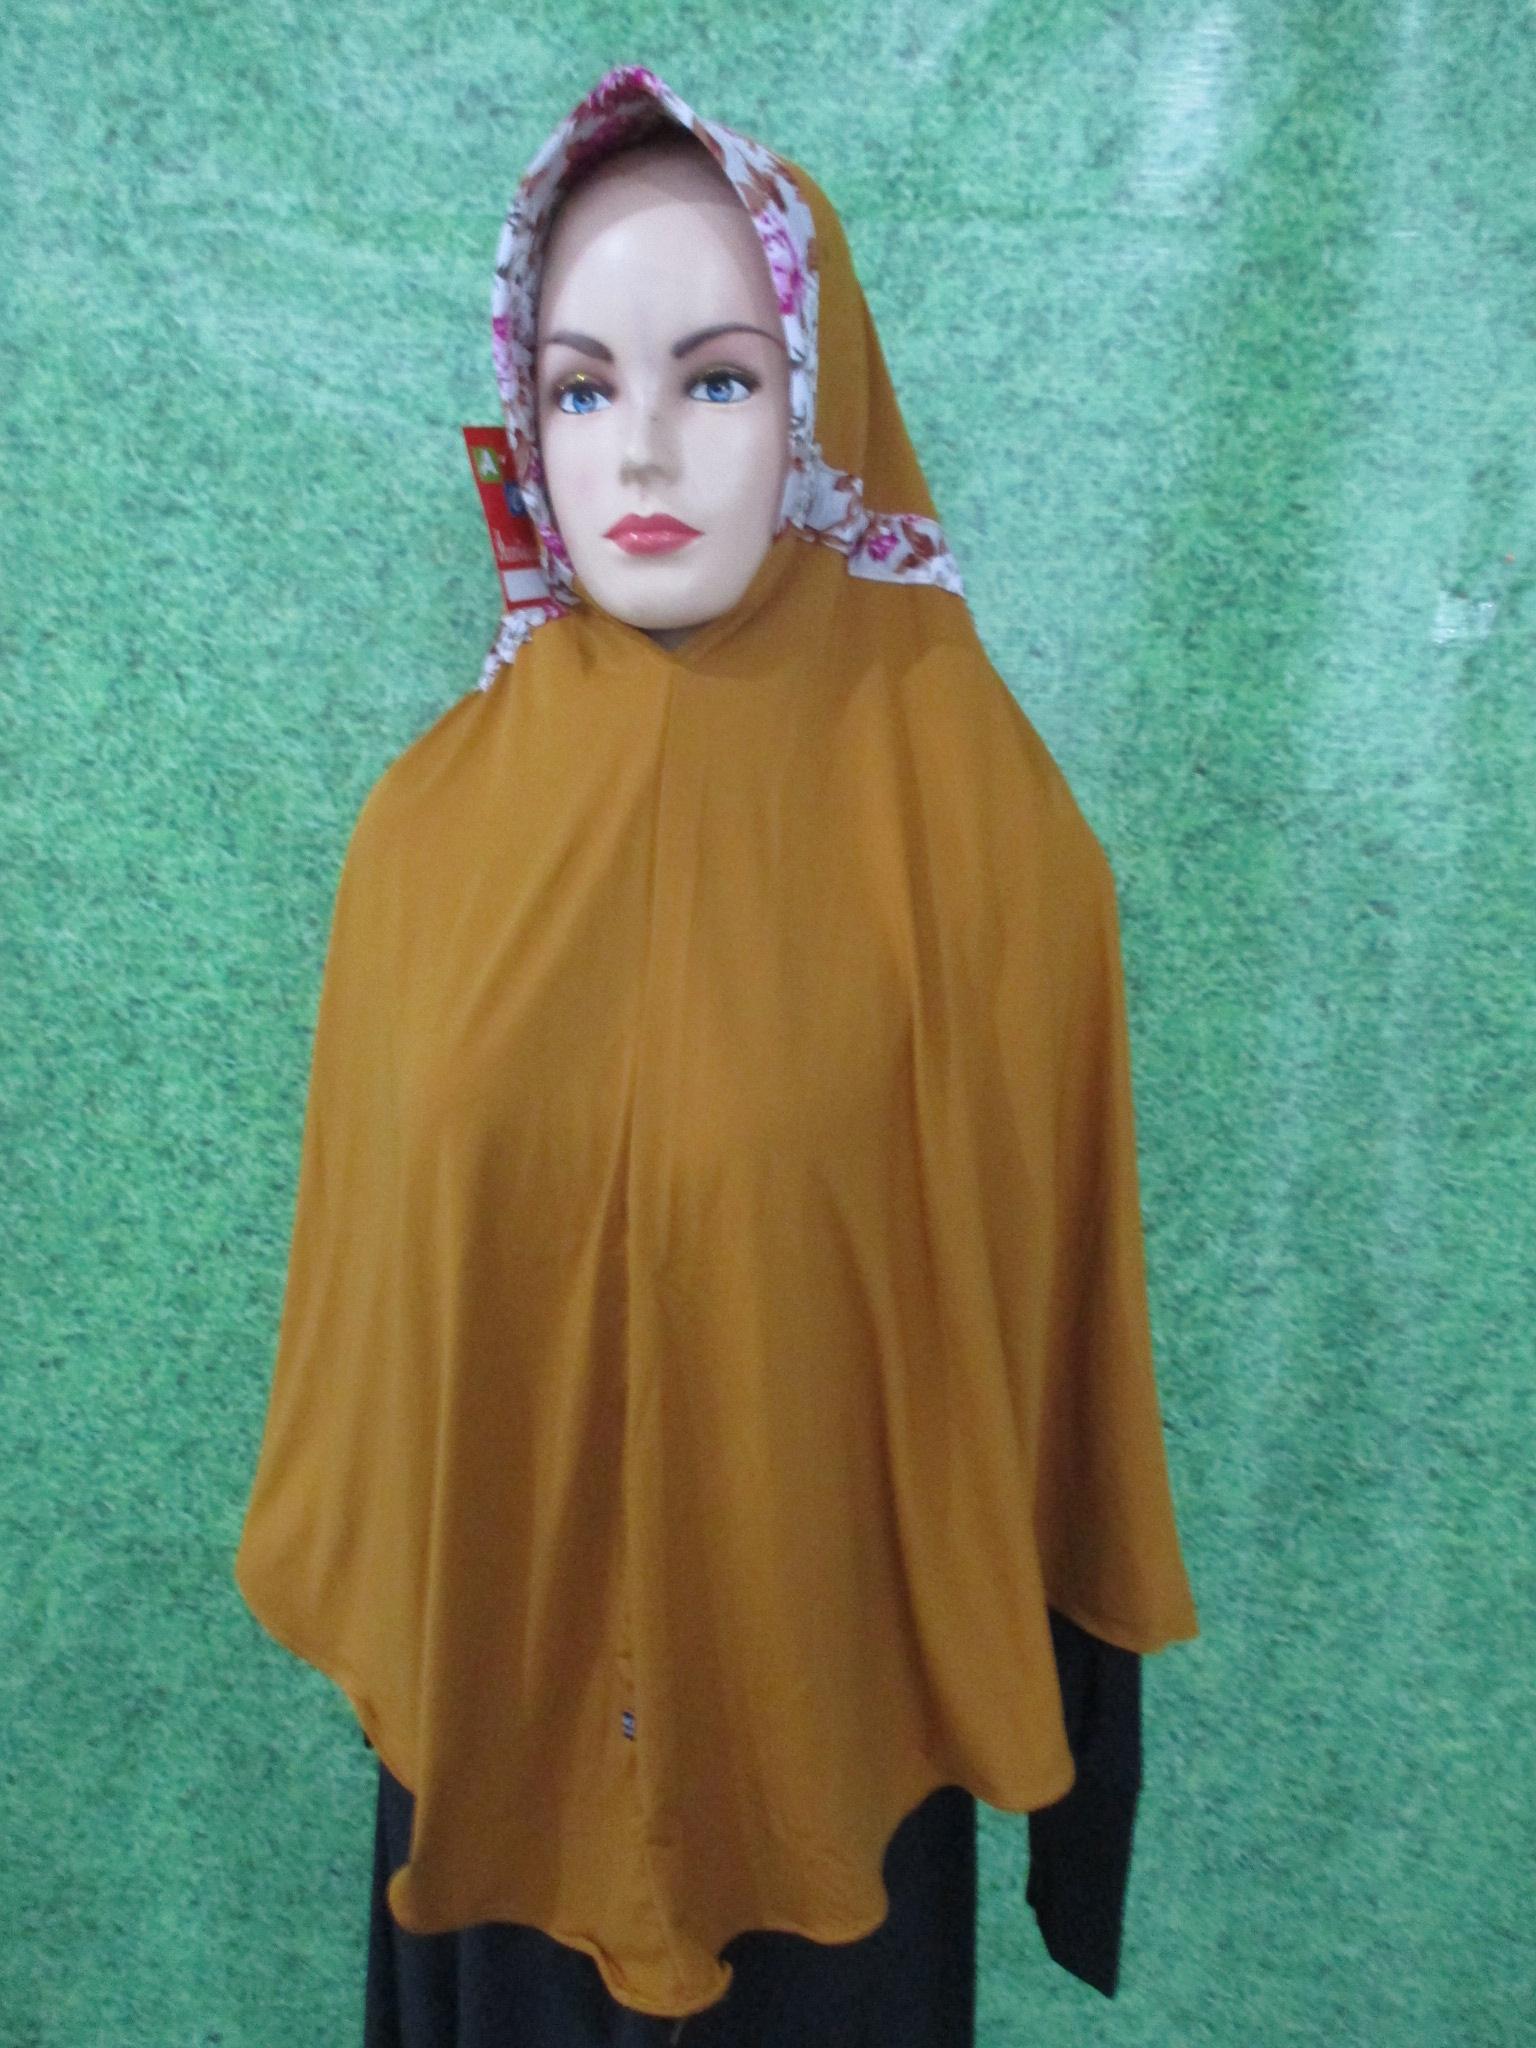 grosir jilbab murah surabaya